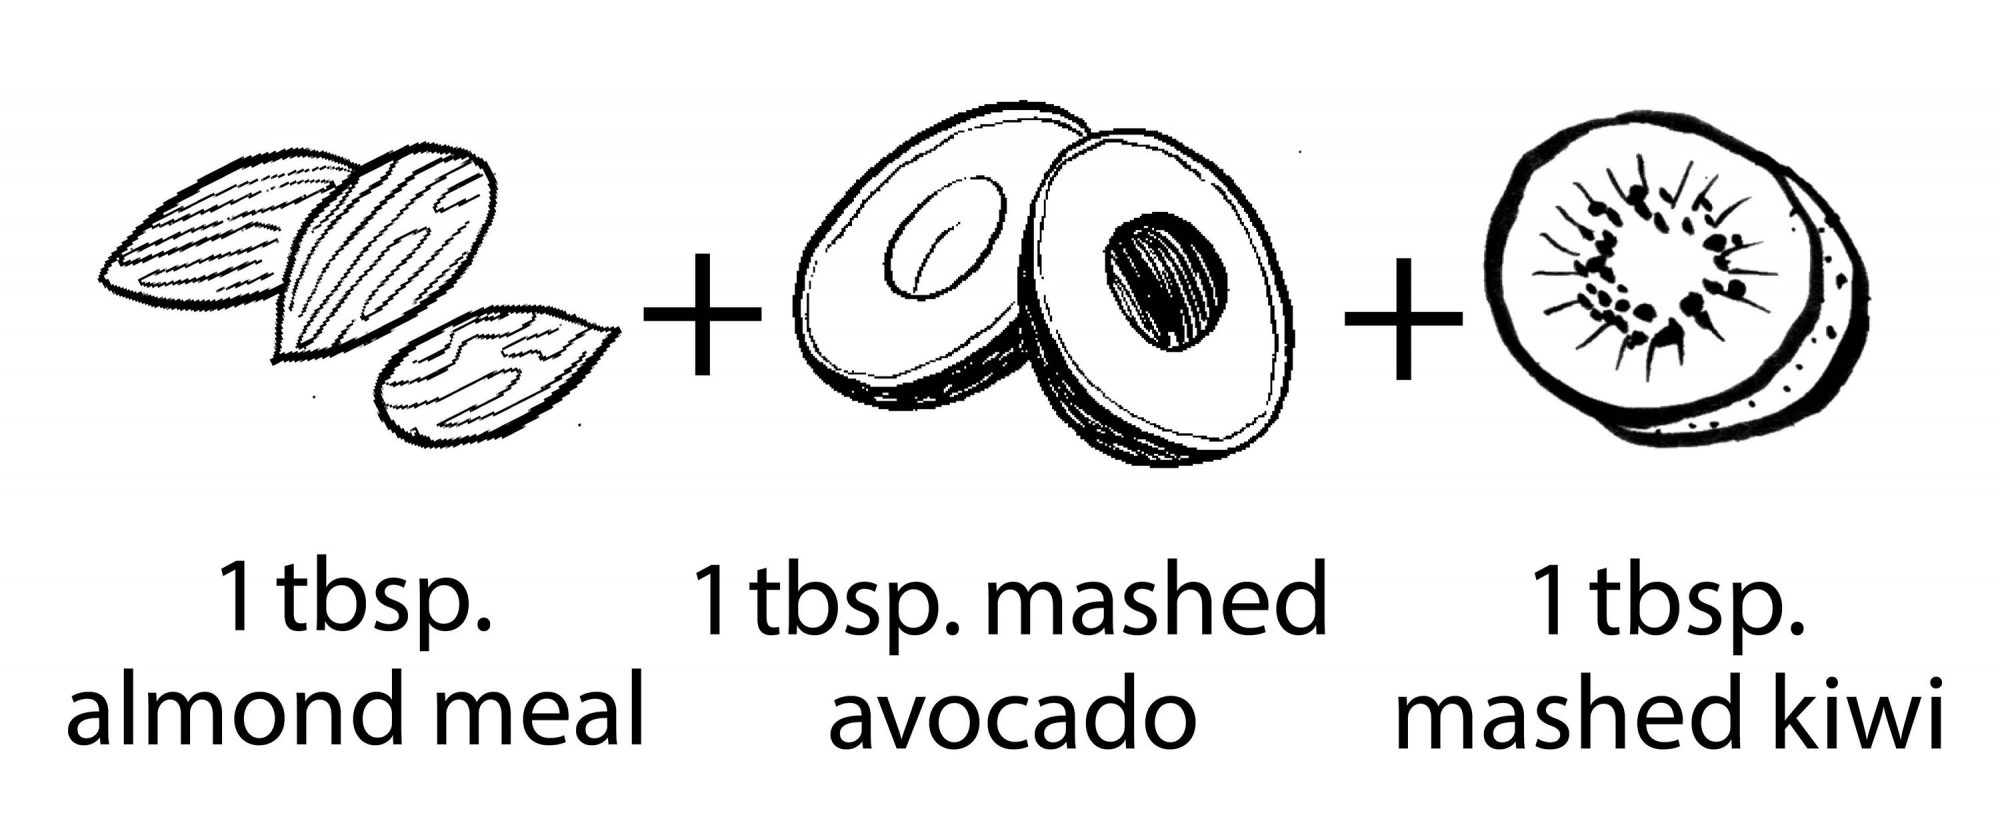 illustration of almonds avocado and kiwi